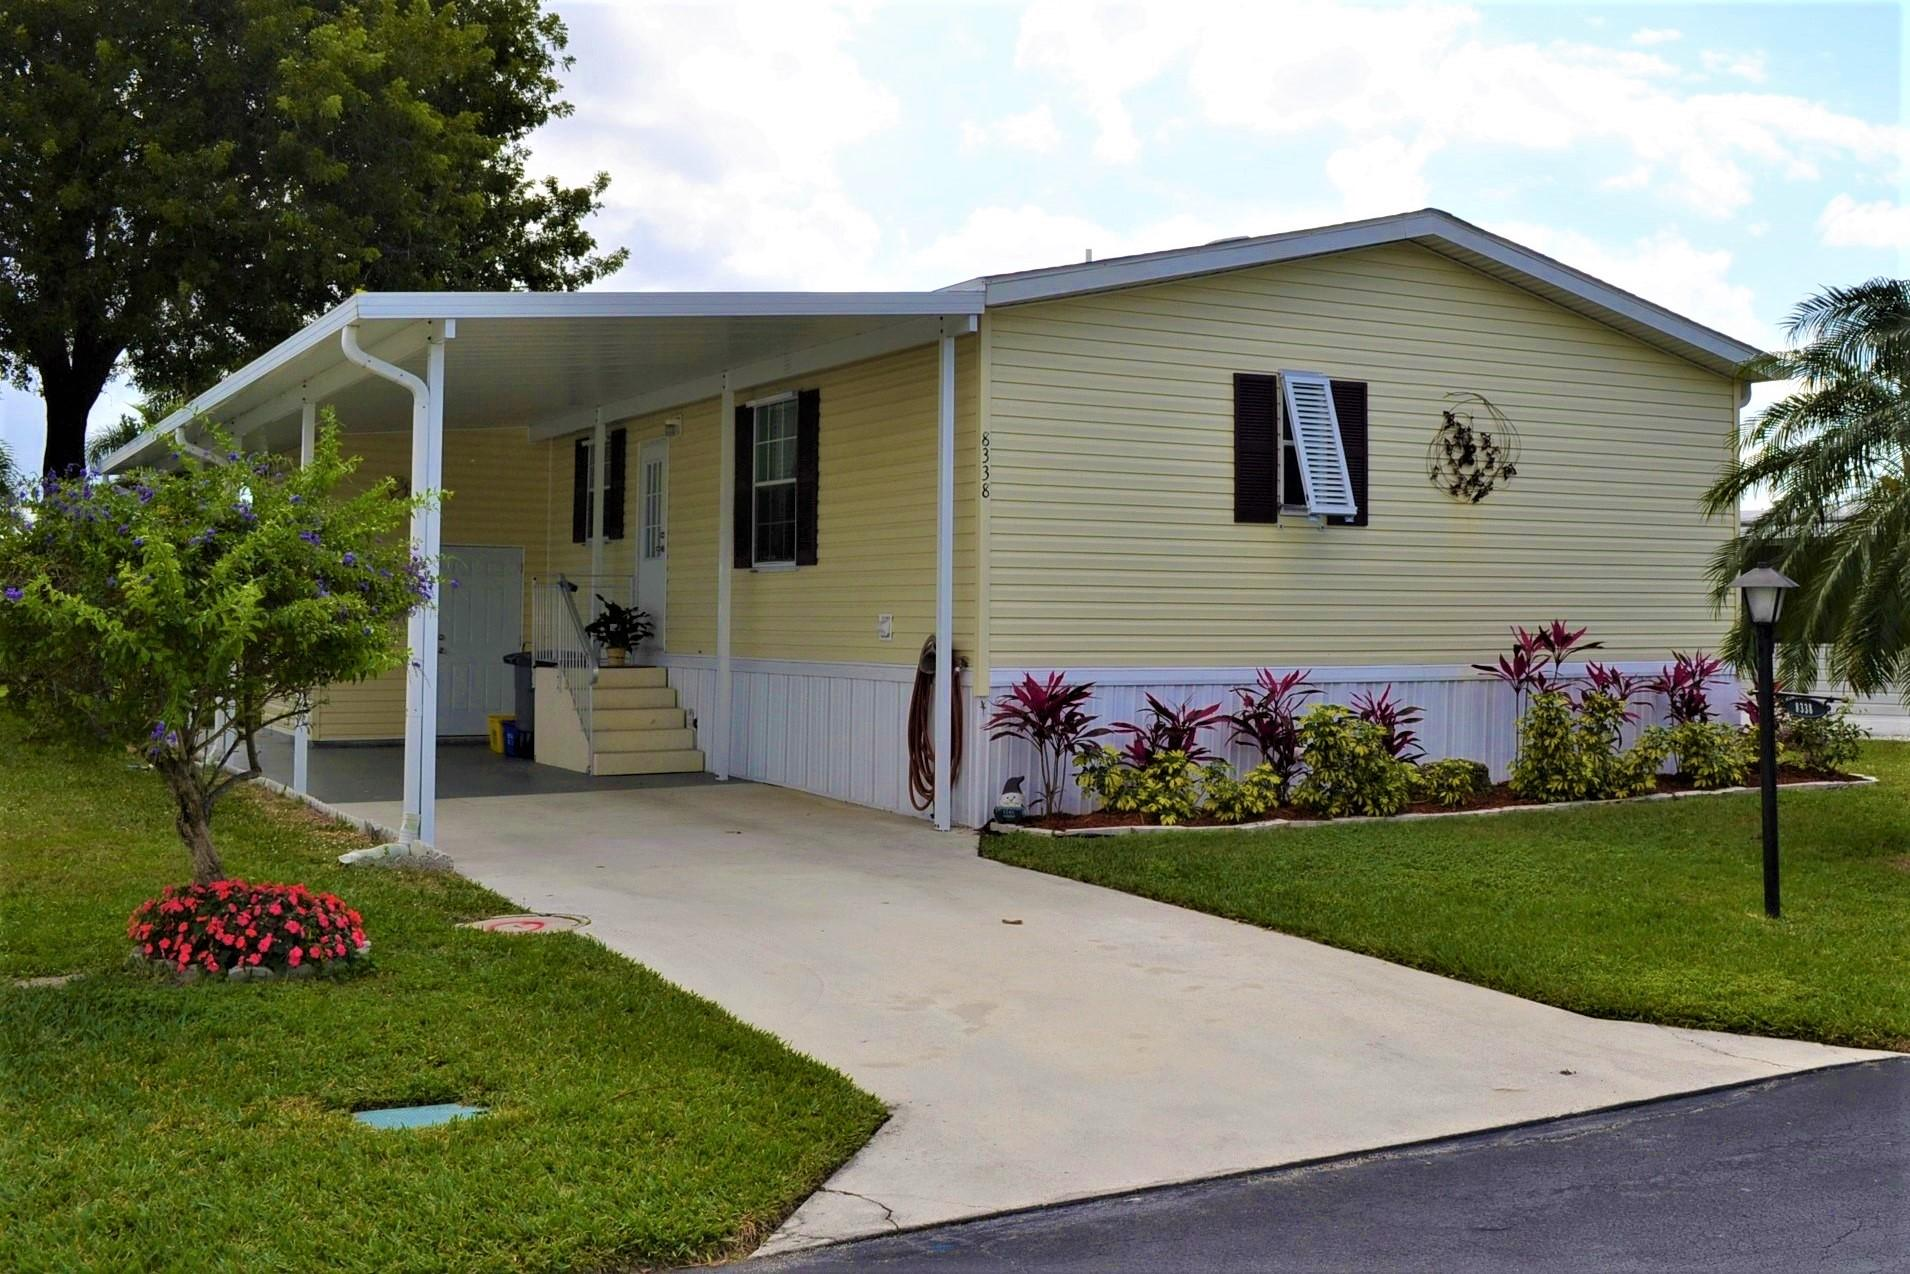 8338 E Club Rd, Boca Raton, FL, 33433